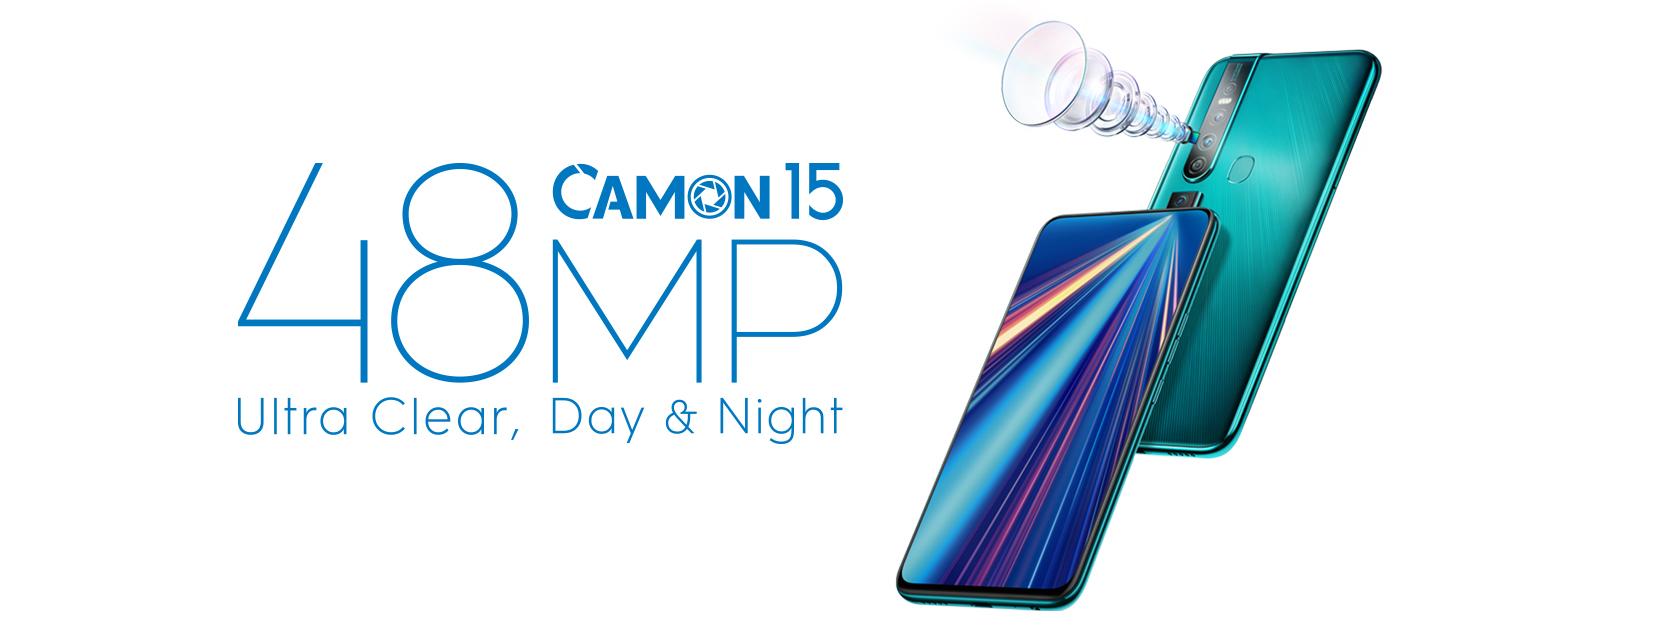 camon-15-techjuice